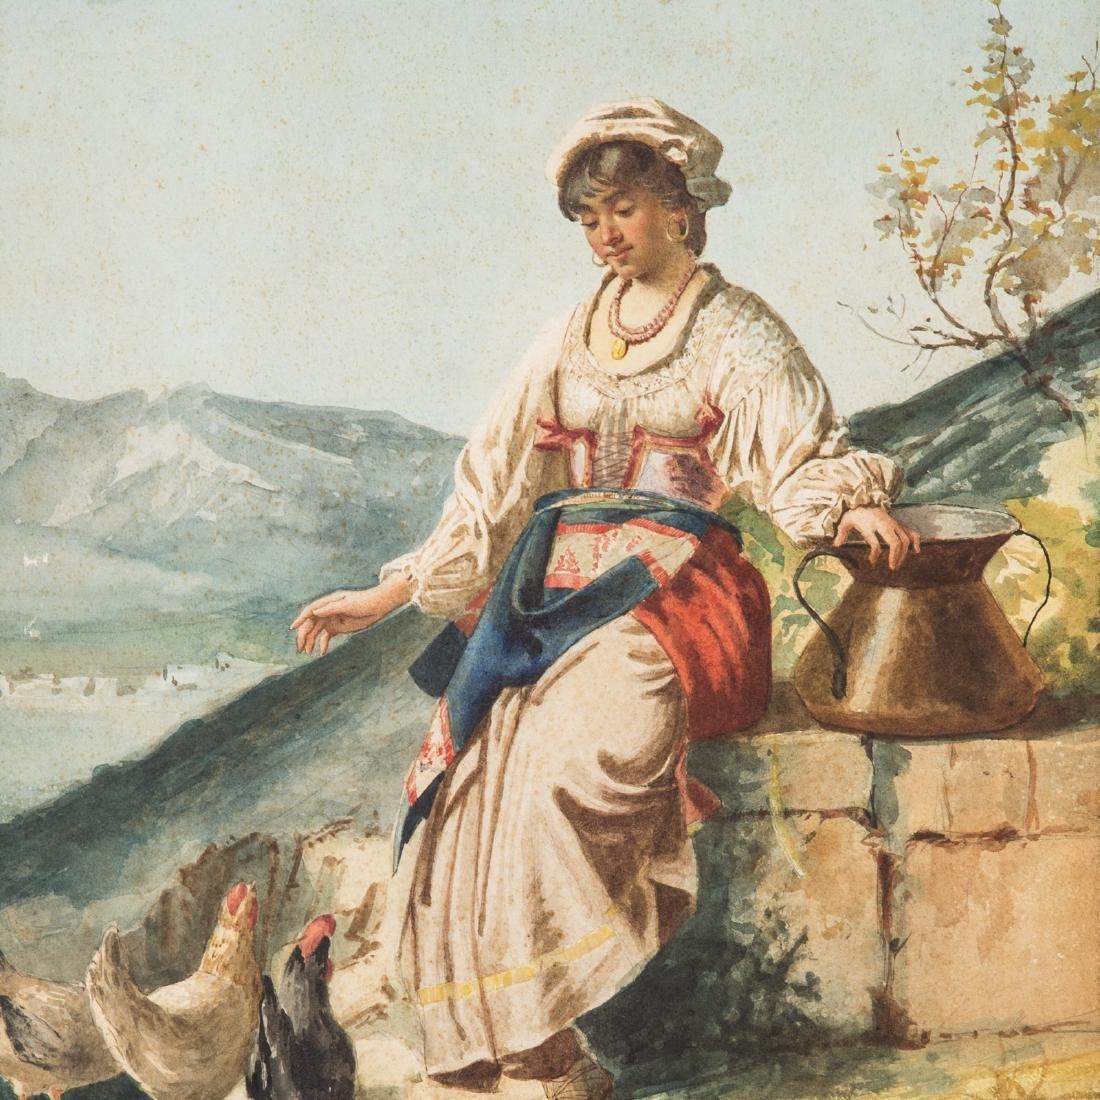 C. Gioca. Contadina with Chickens, watercolor - 2